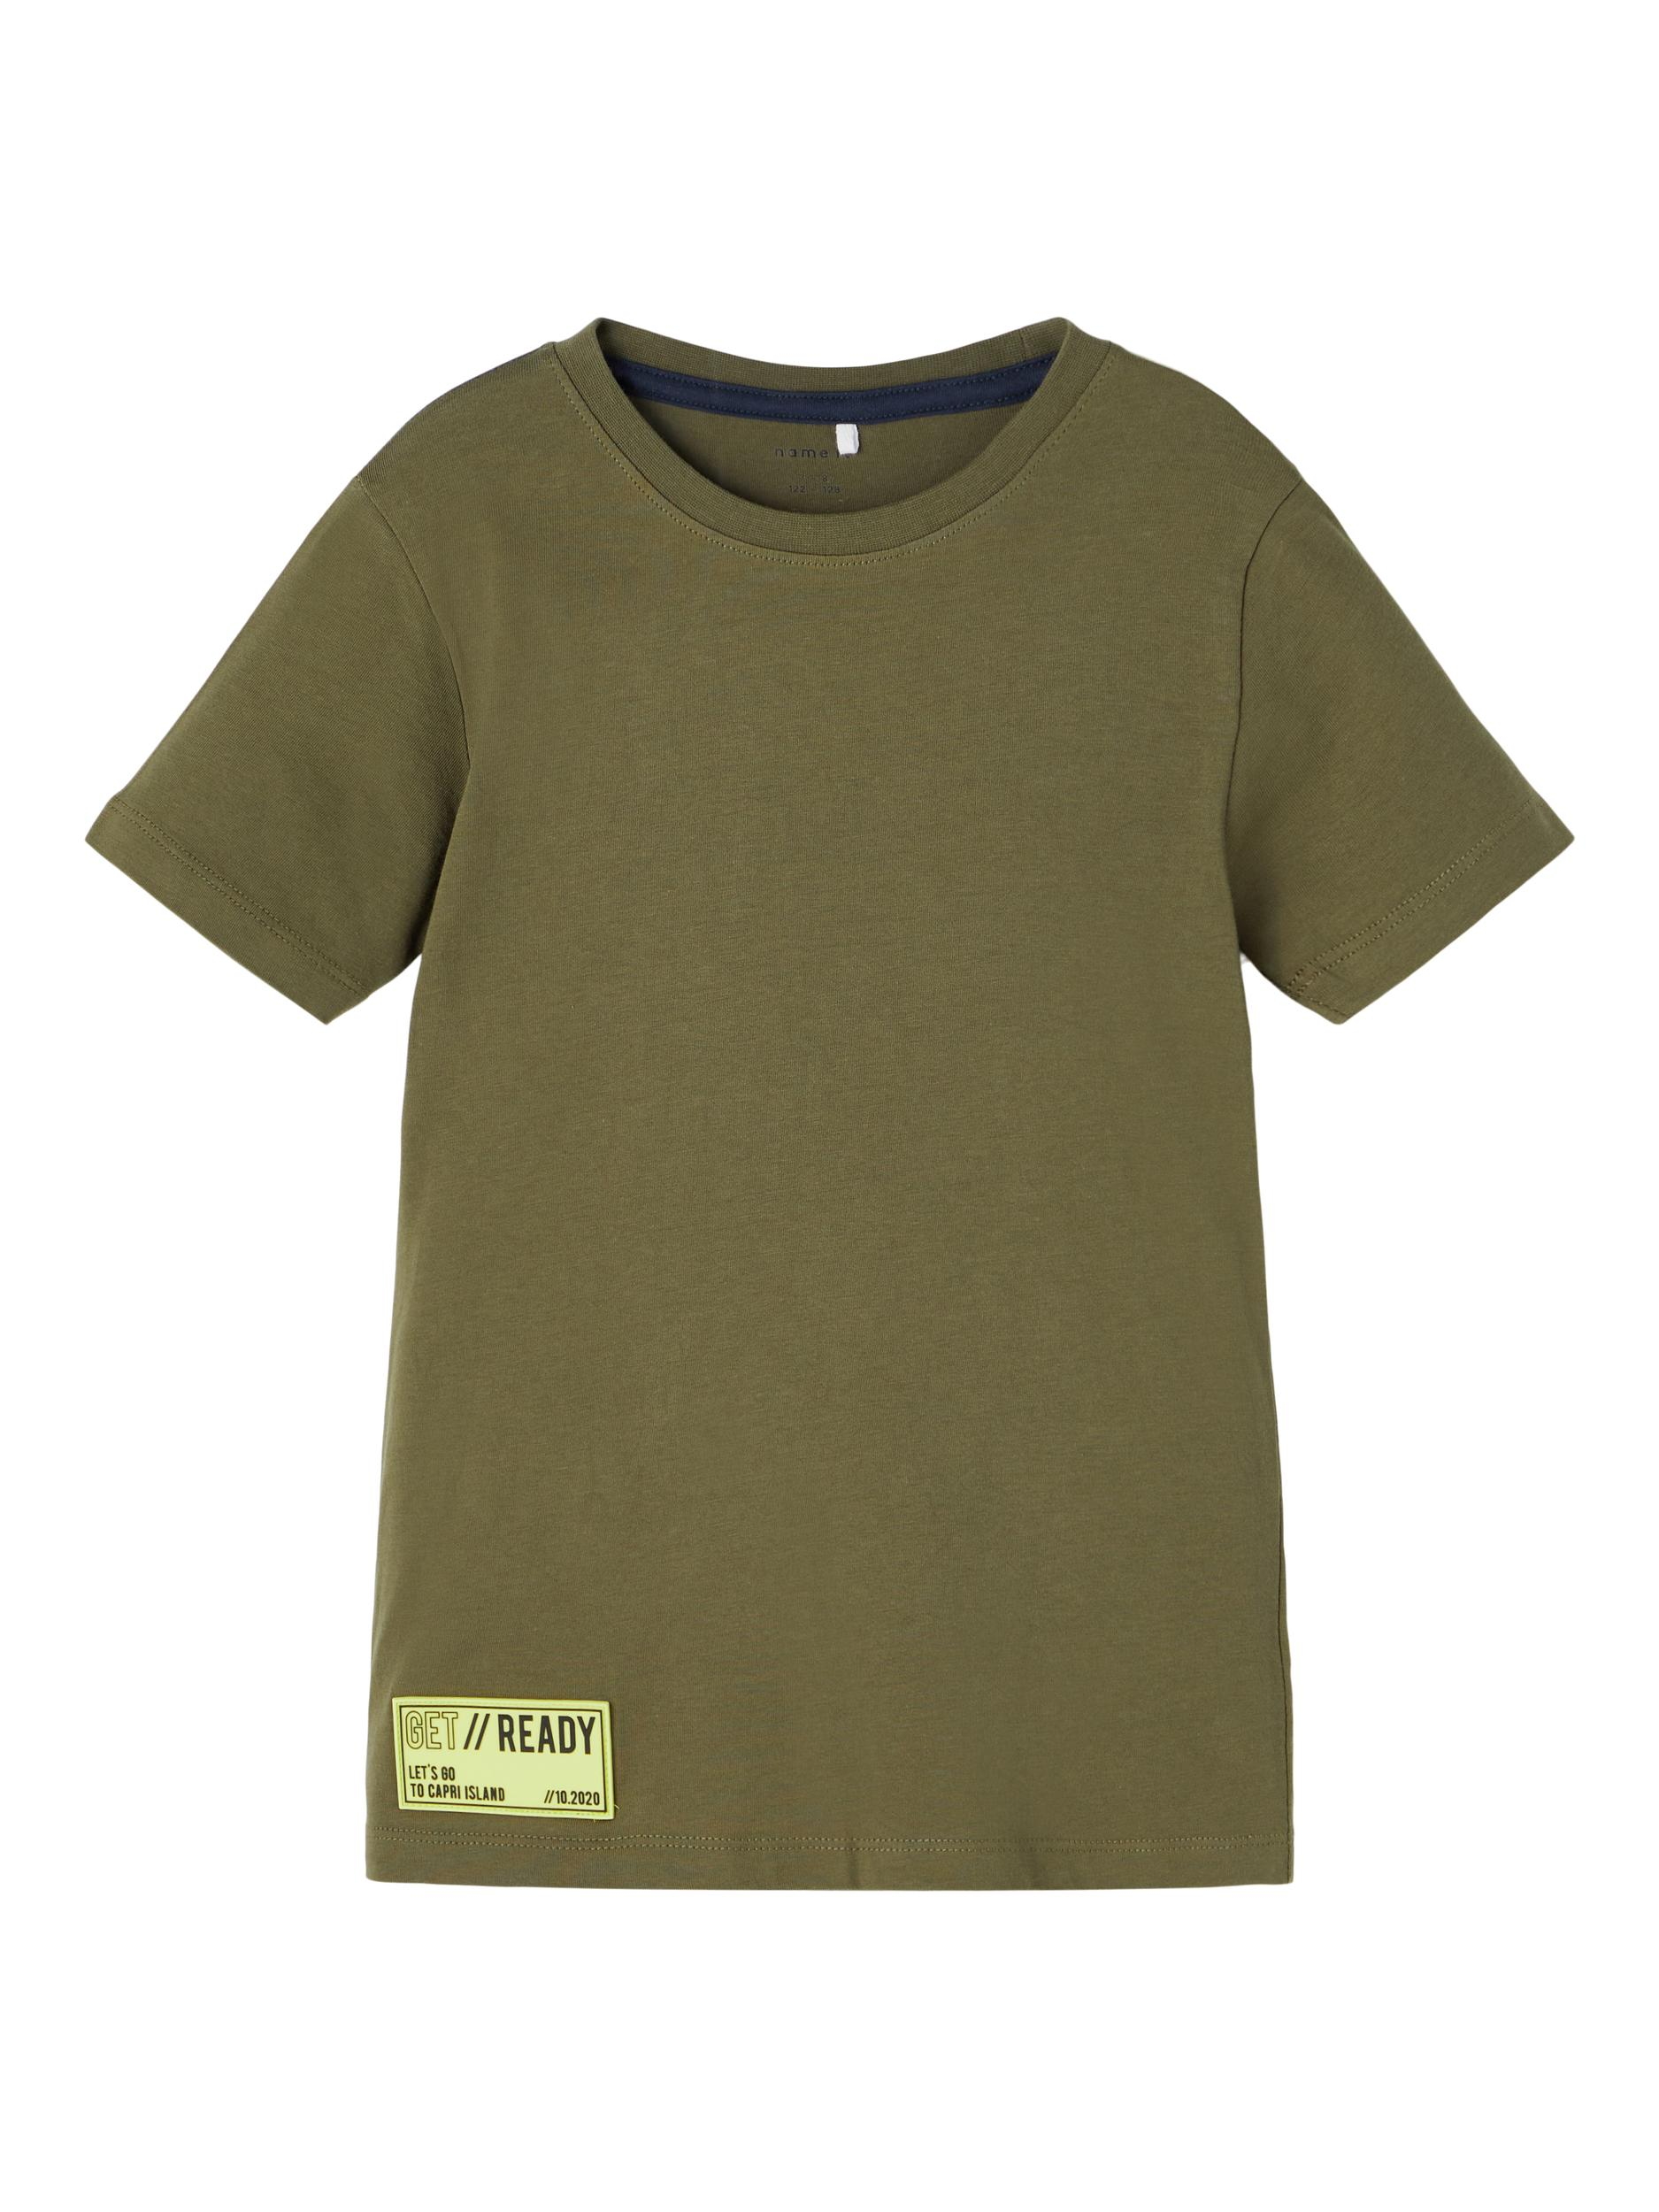 Name It Jacce t-shirt